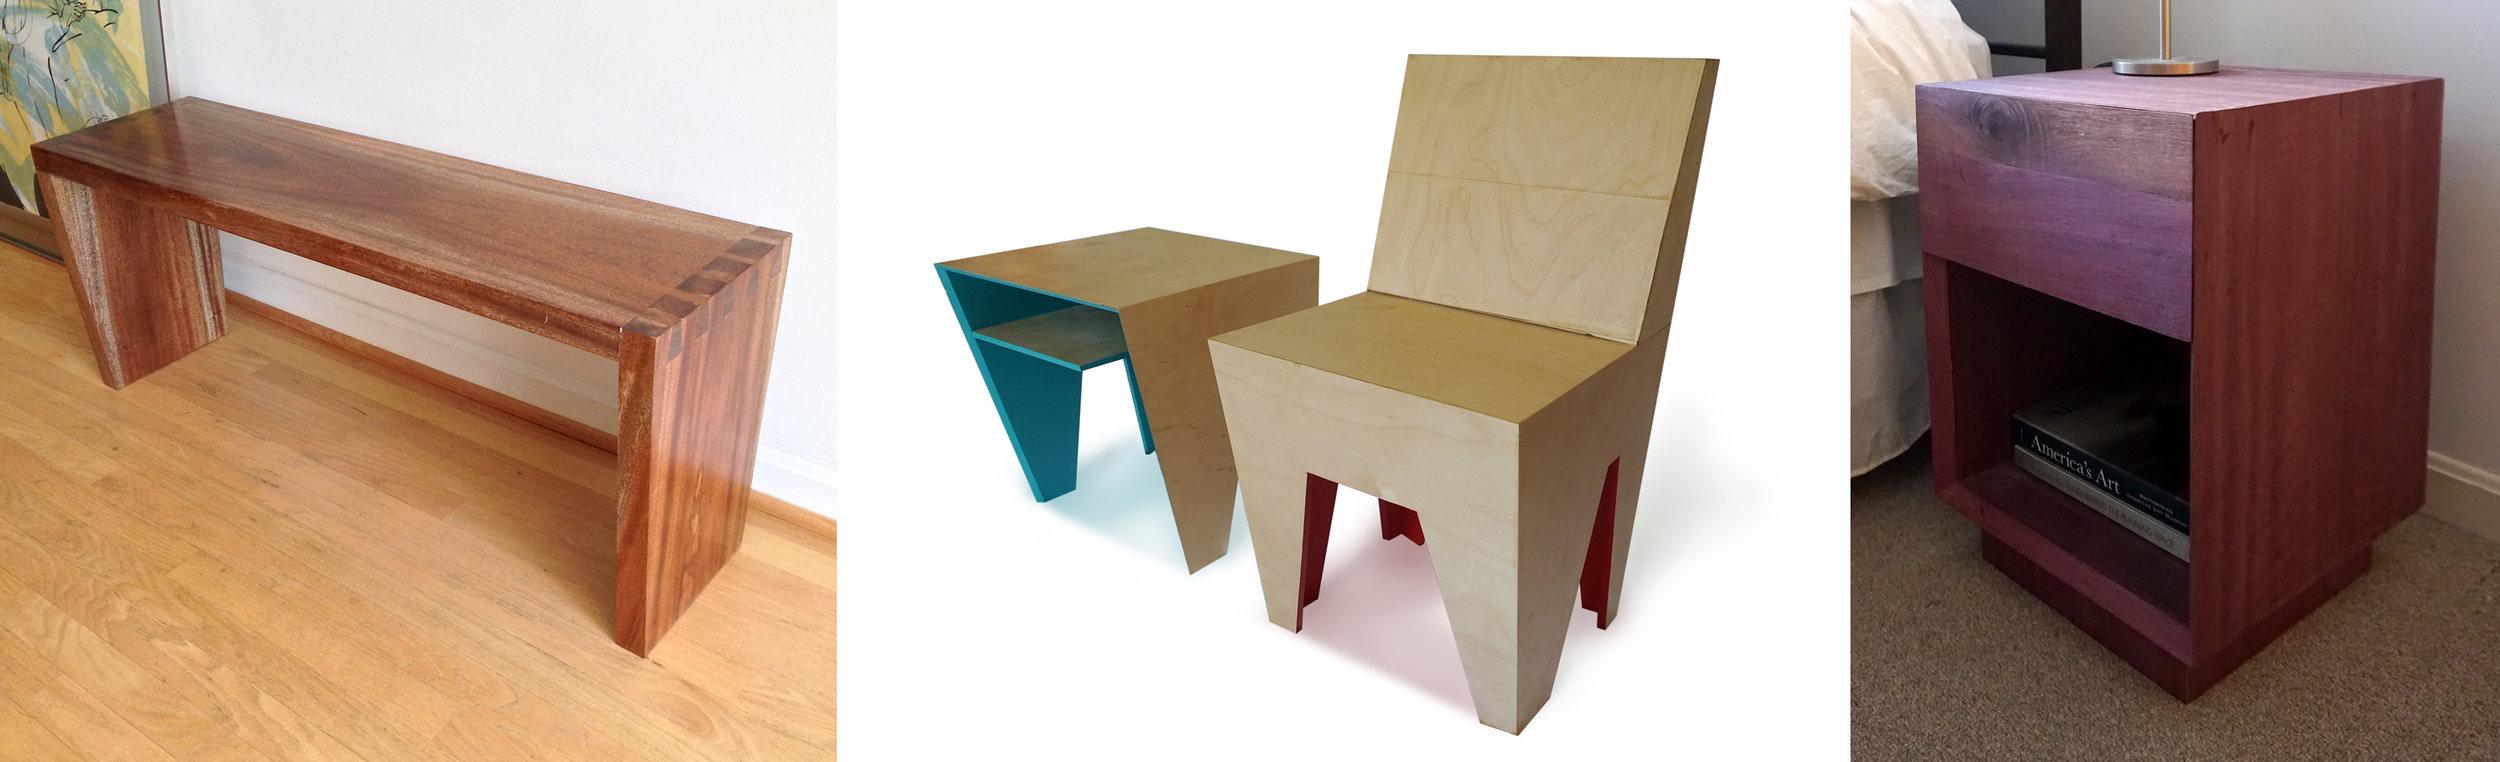 furniture_composite.jpg